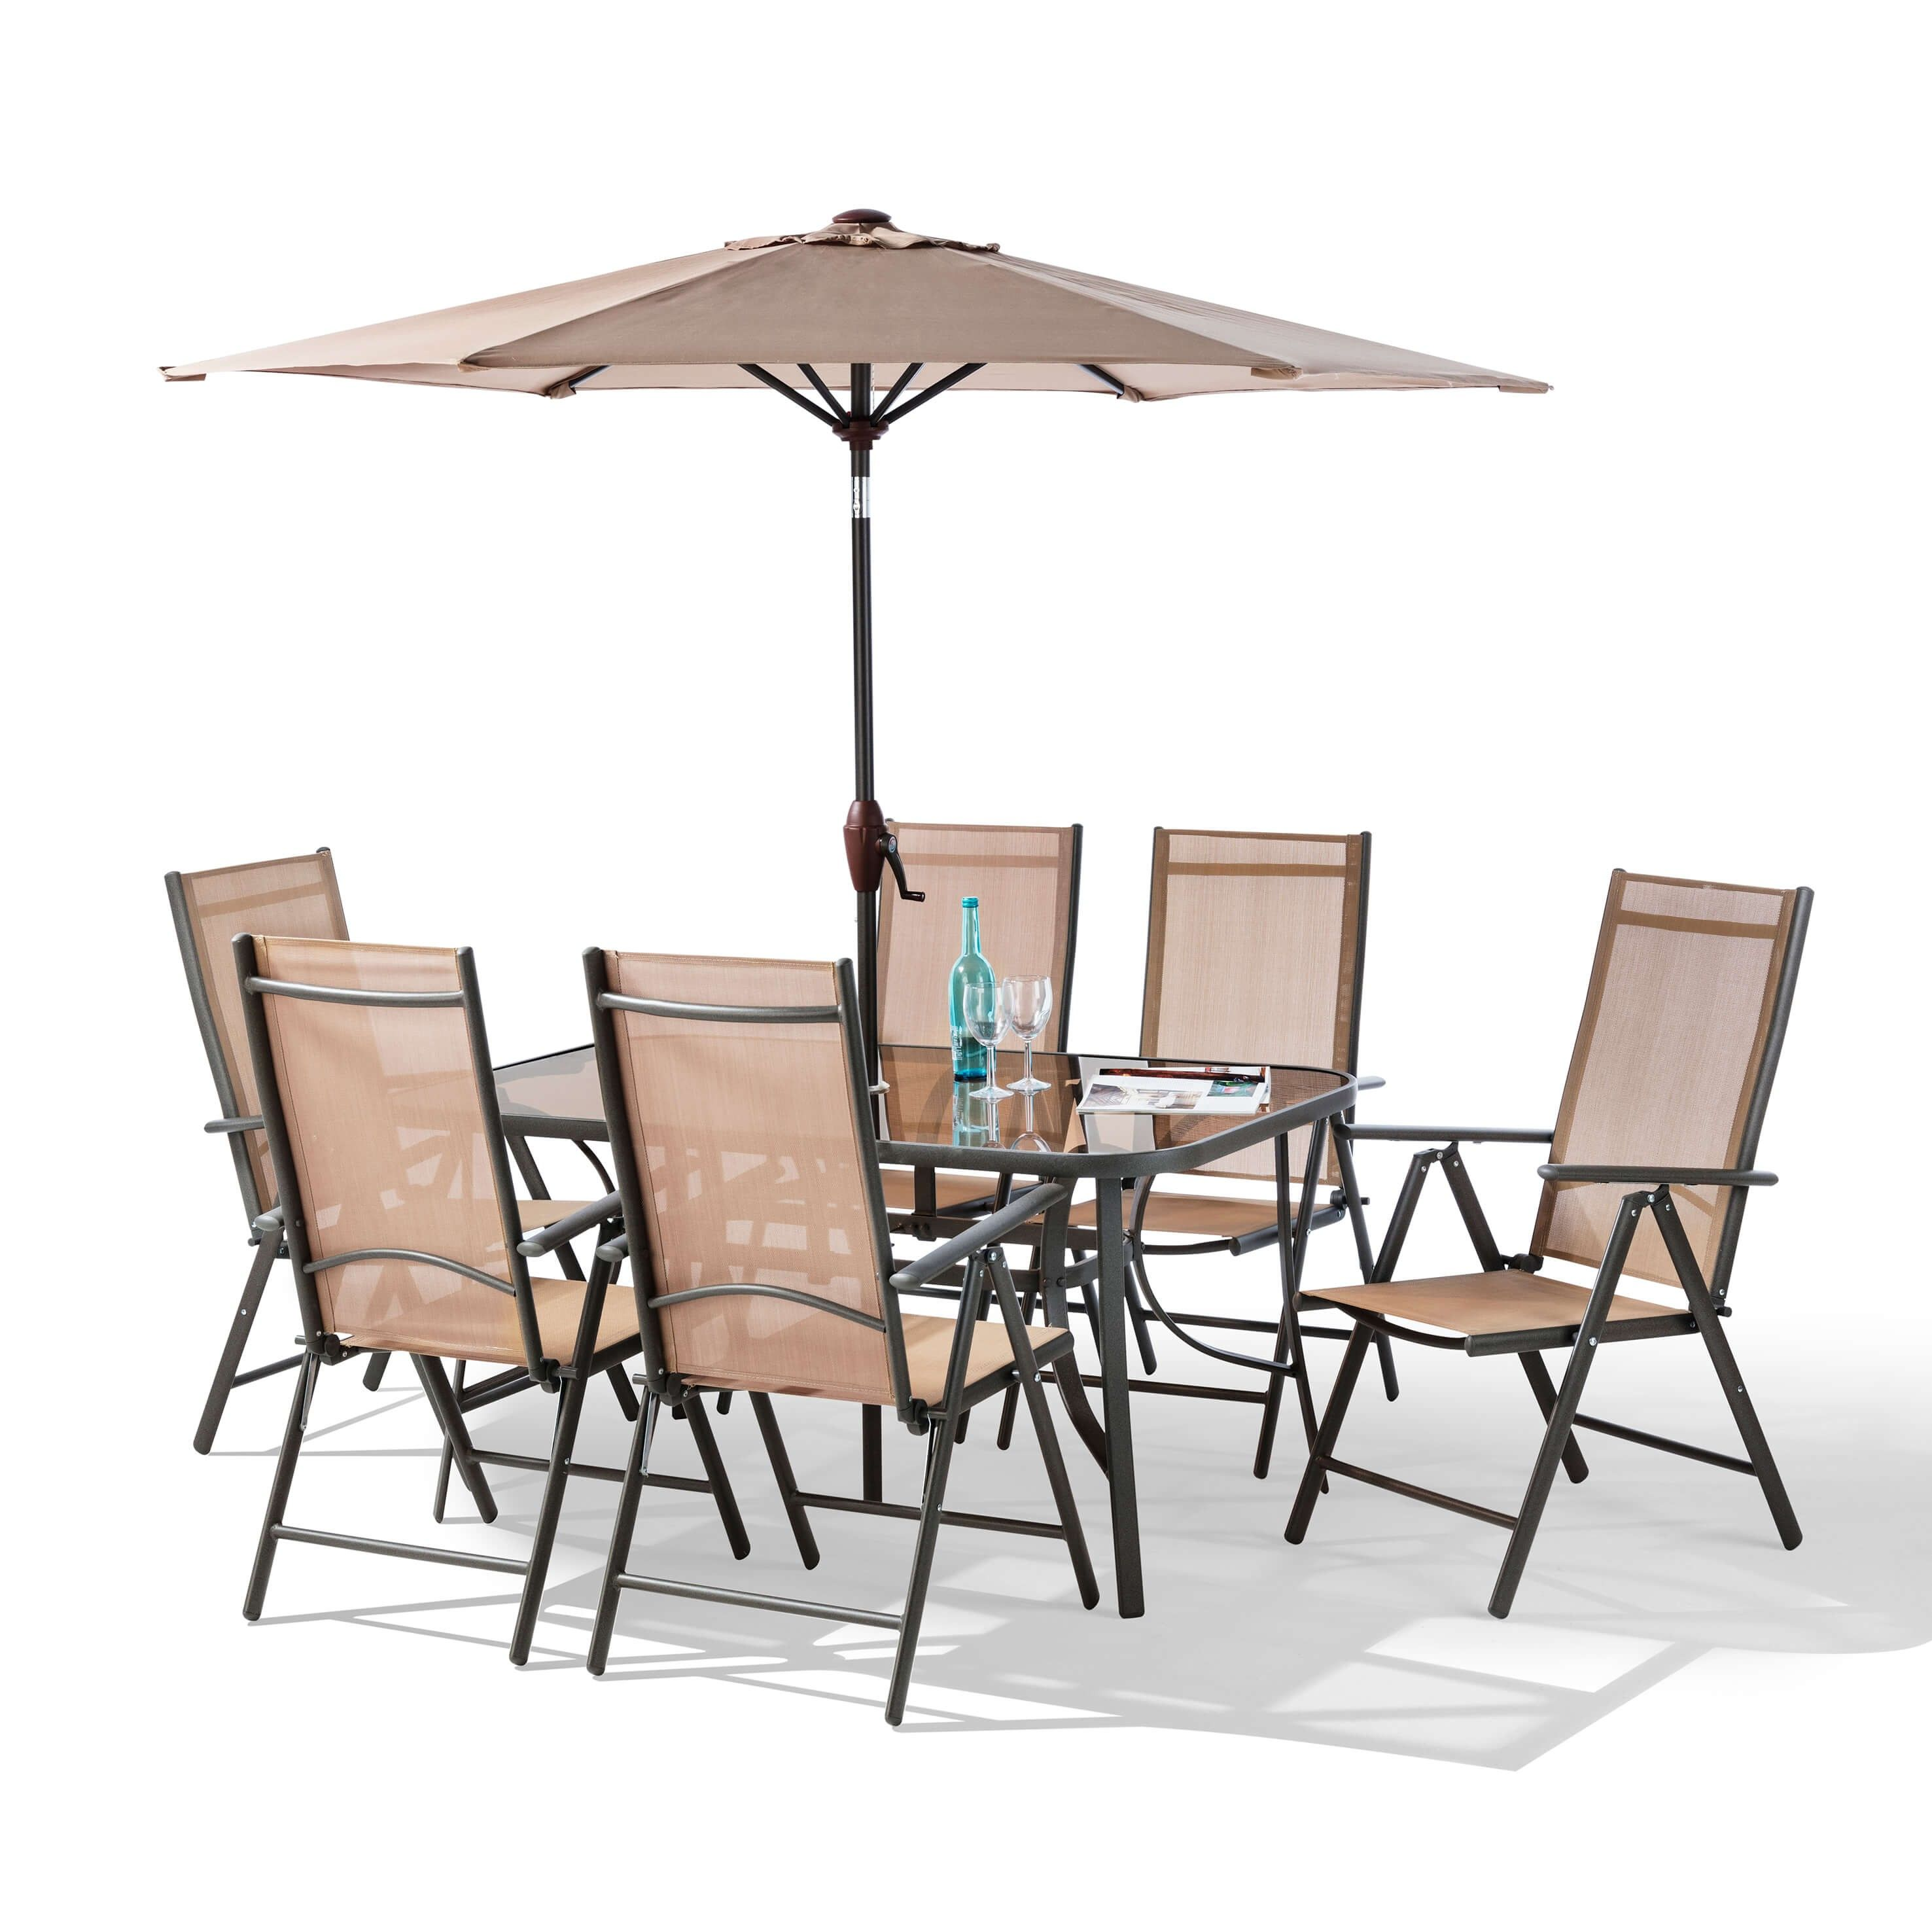 the 8 piece santorini garden patio set comes with 6 x 7 point